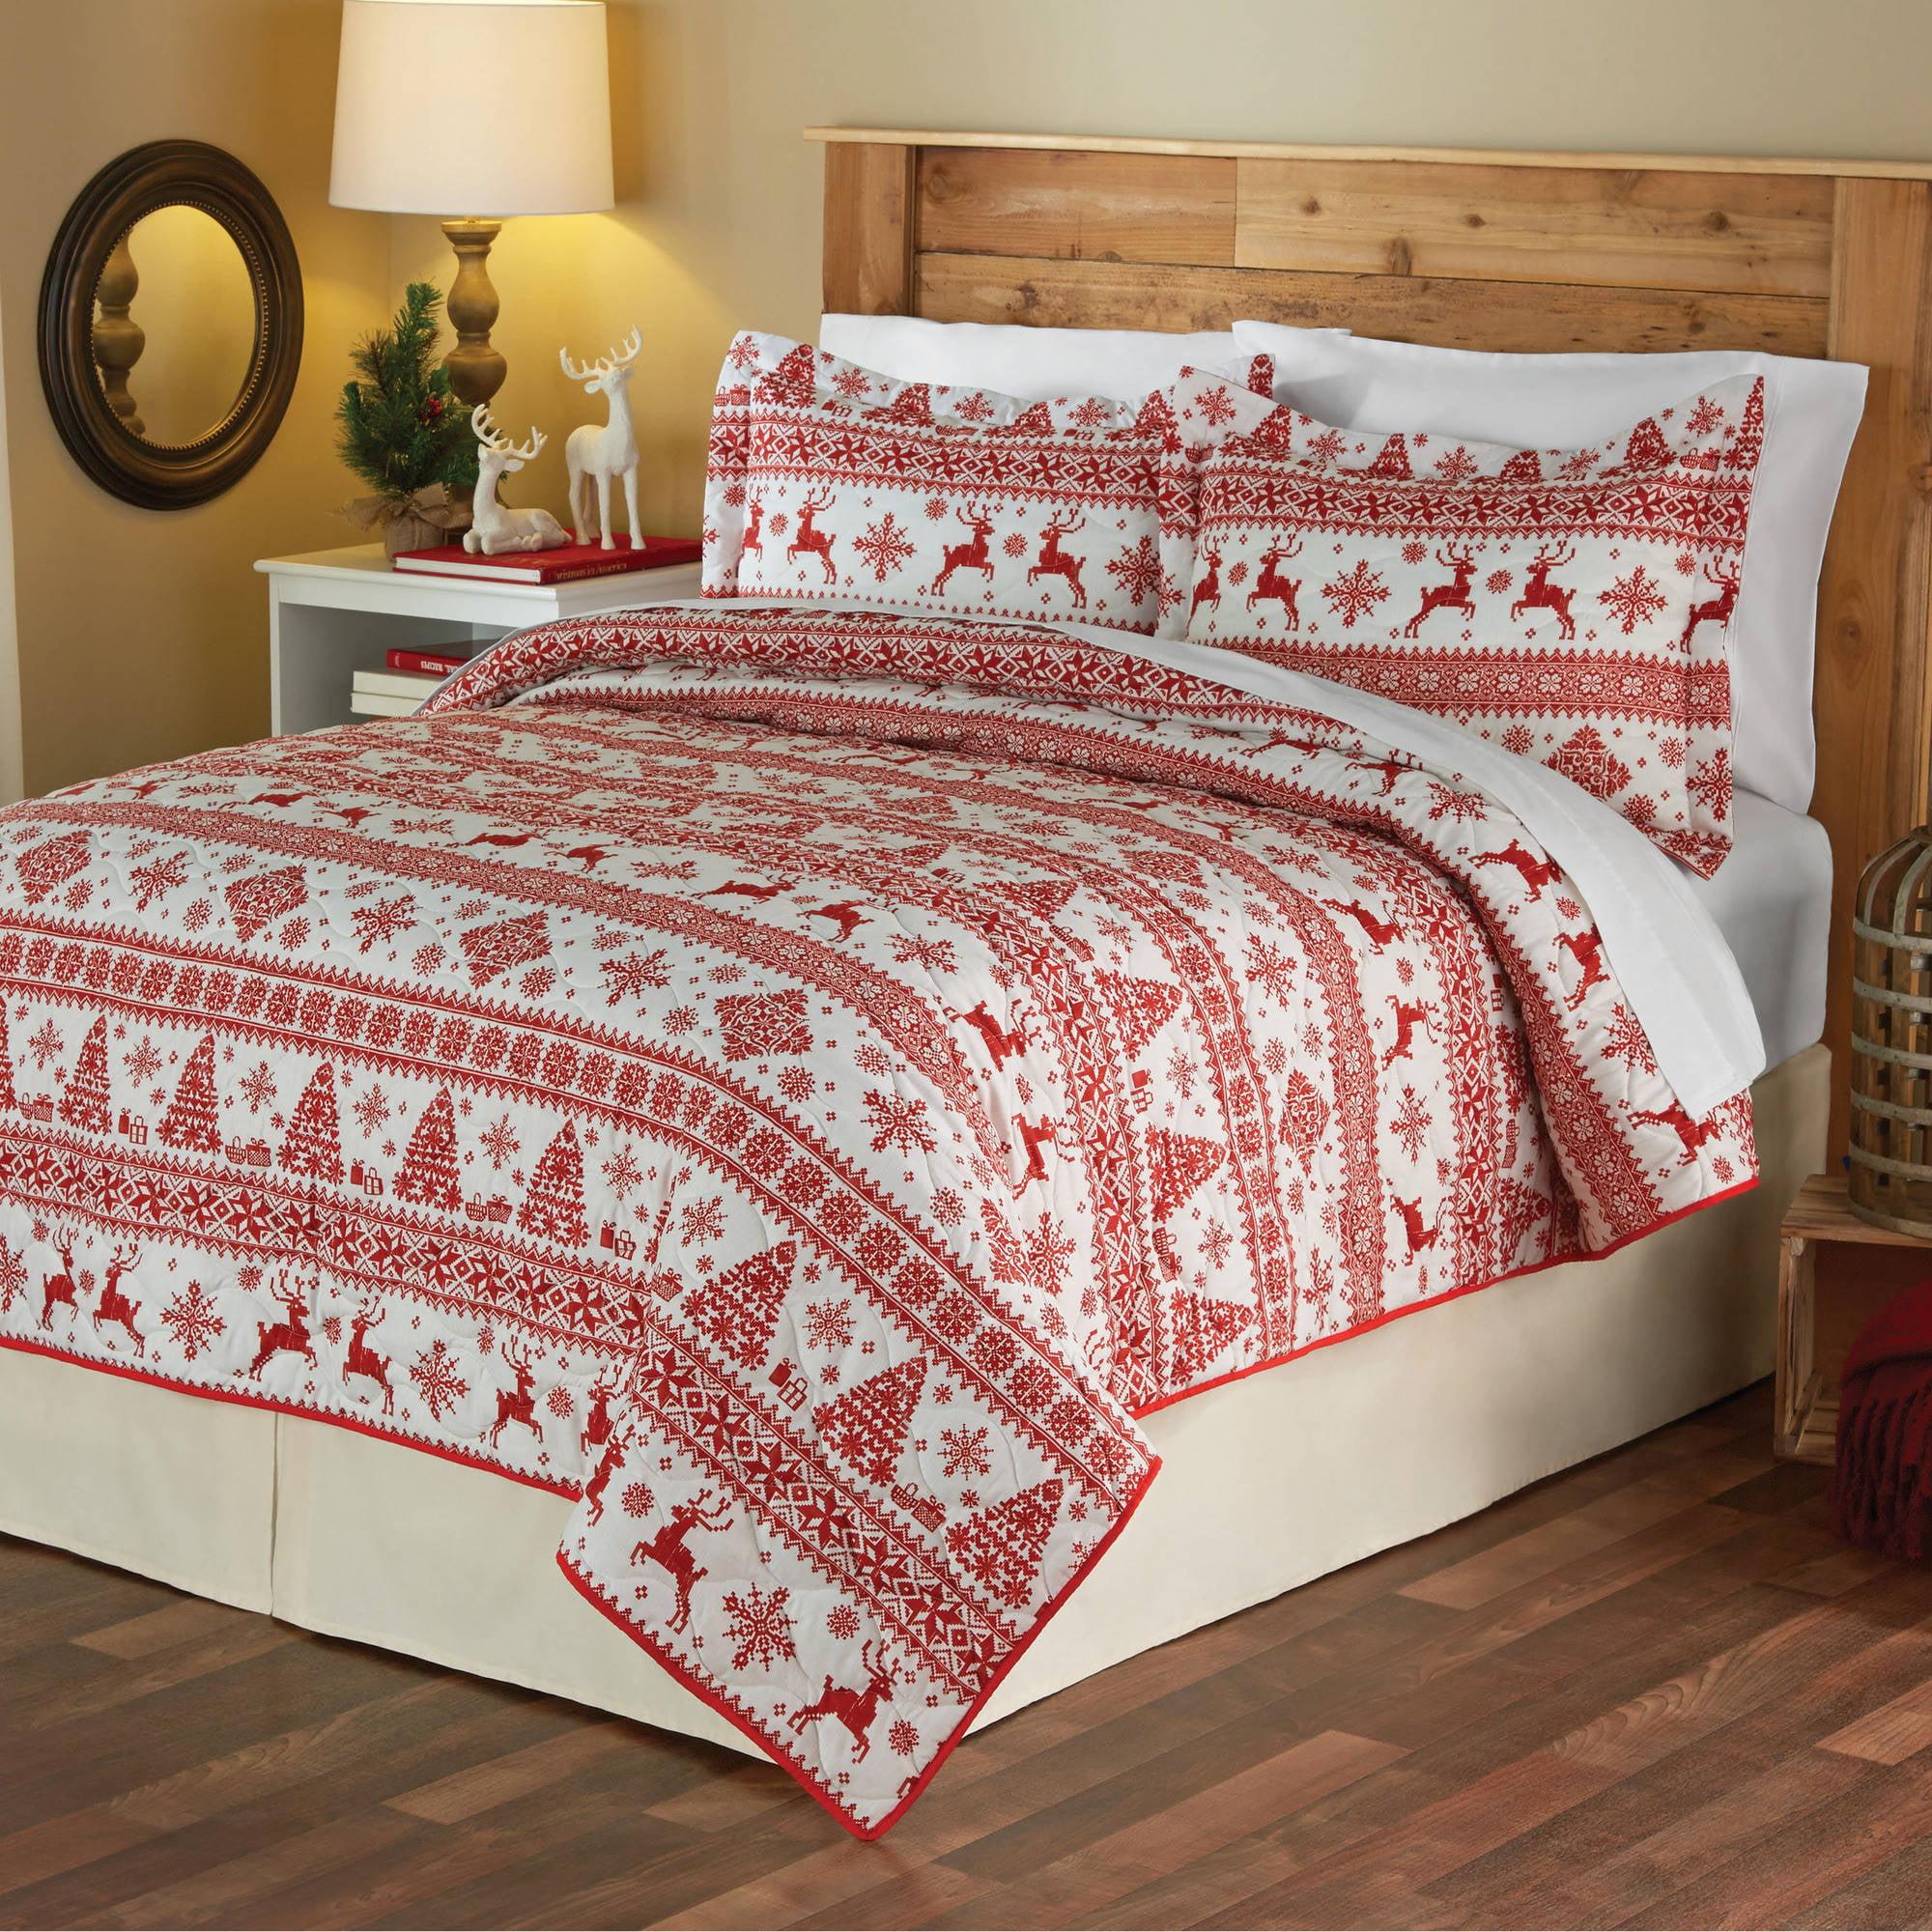 Mainstays Christmas Sweater Holiday Quilt Set - Walmart.com